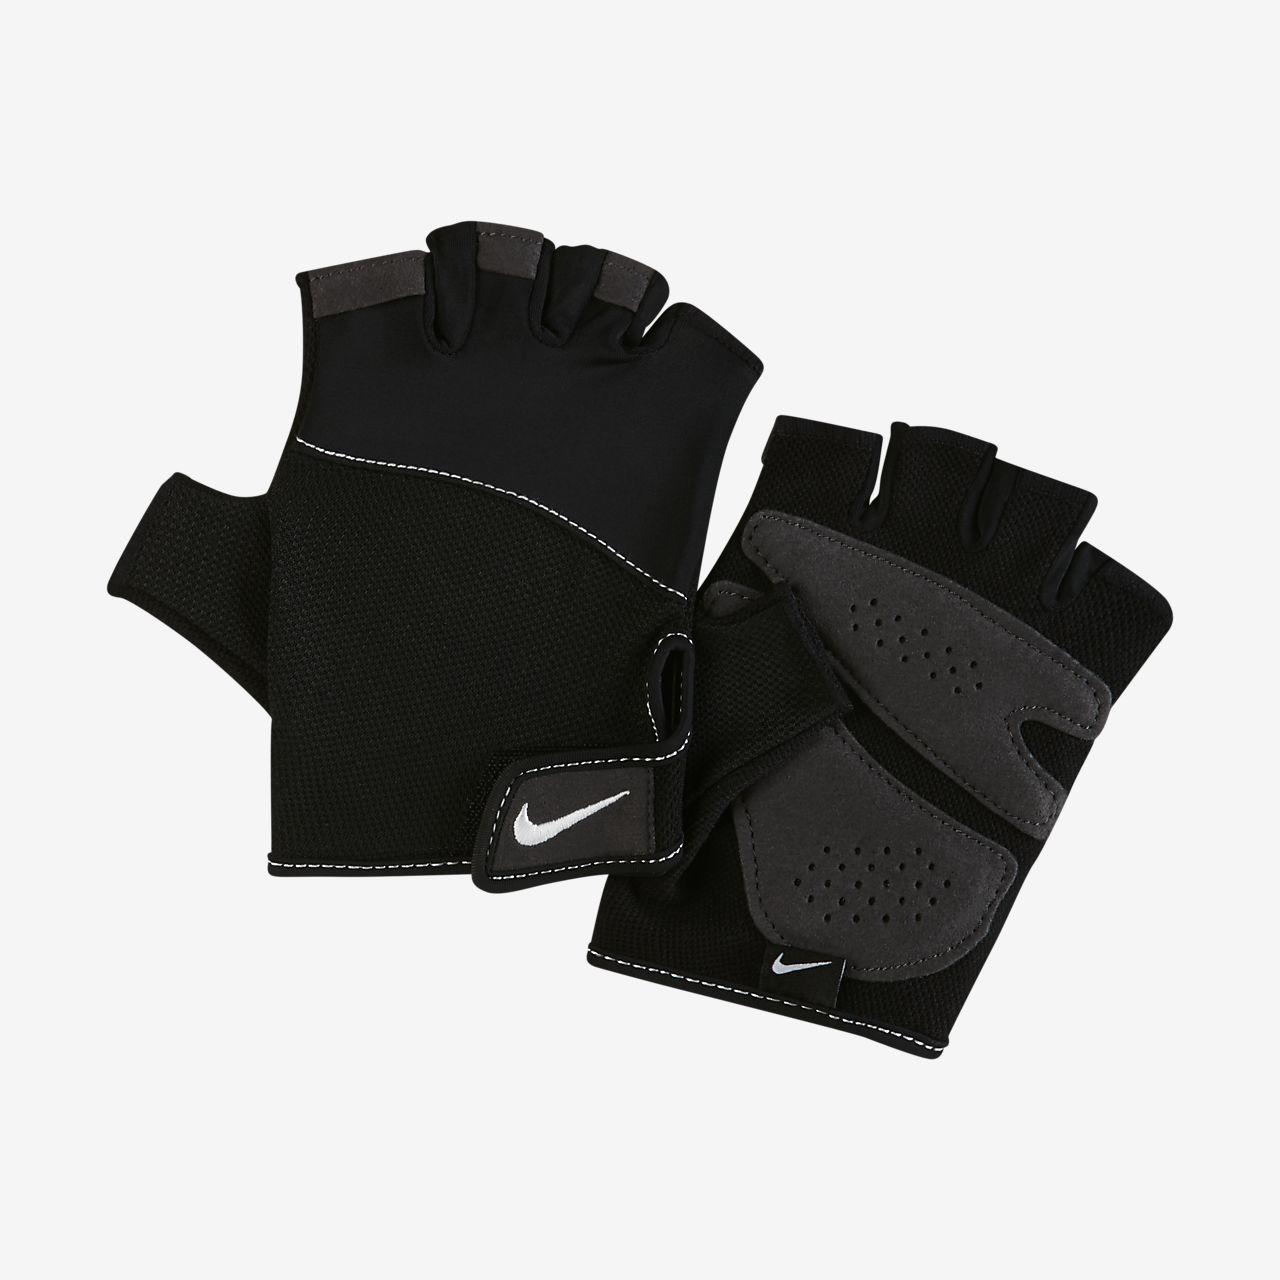 Nike Elemental Fitness Trainingshandschoenen voor dames